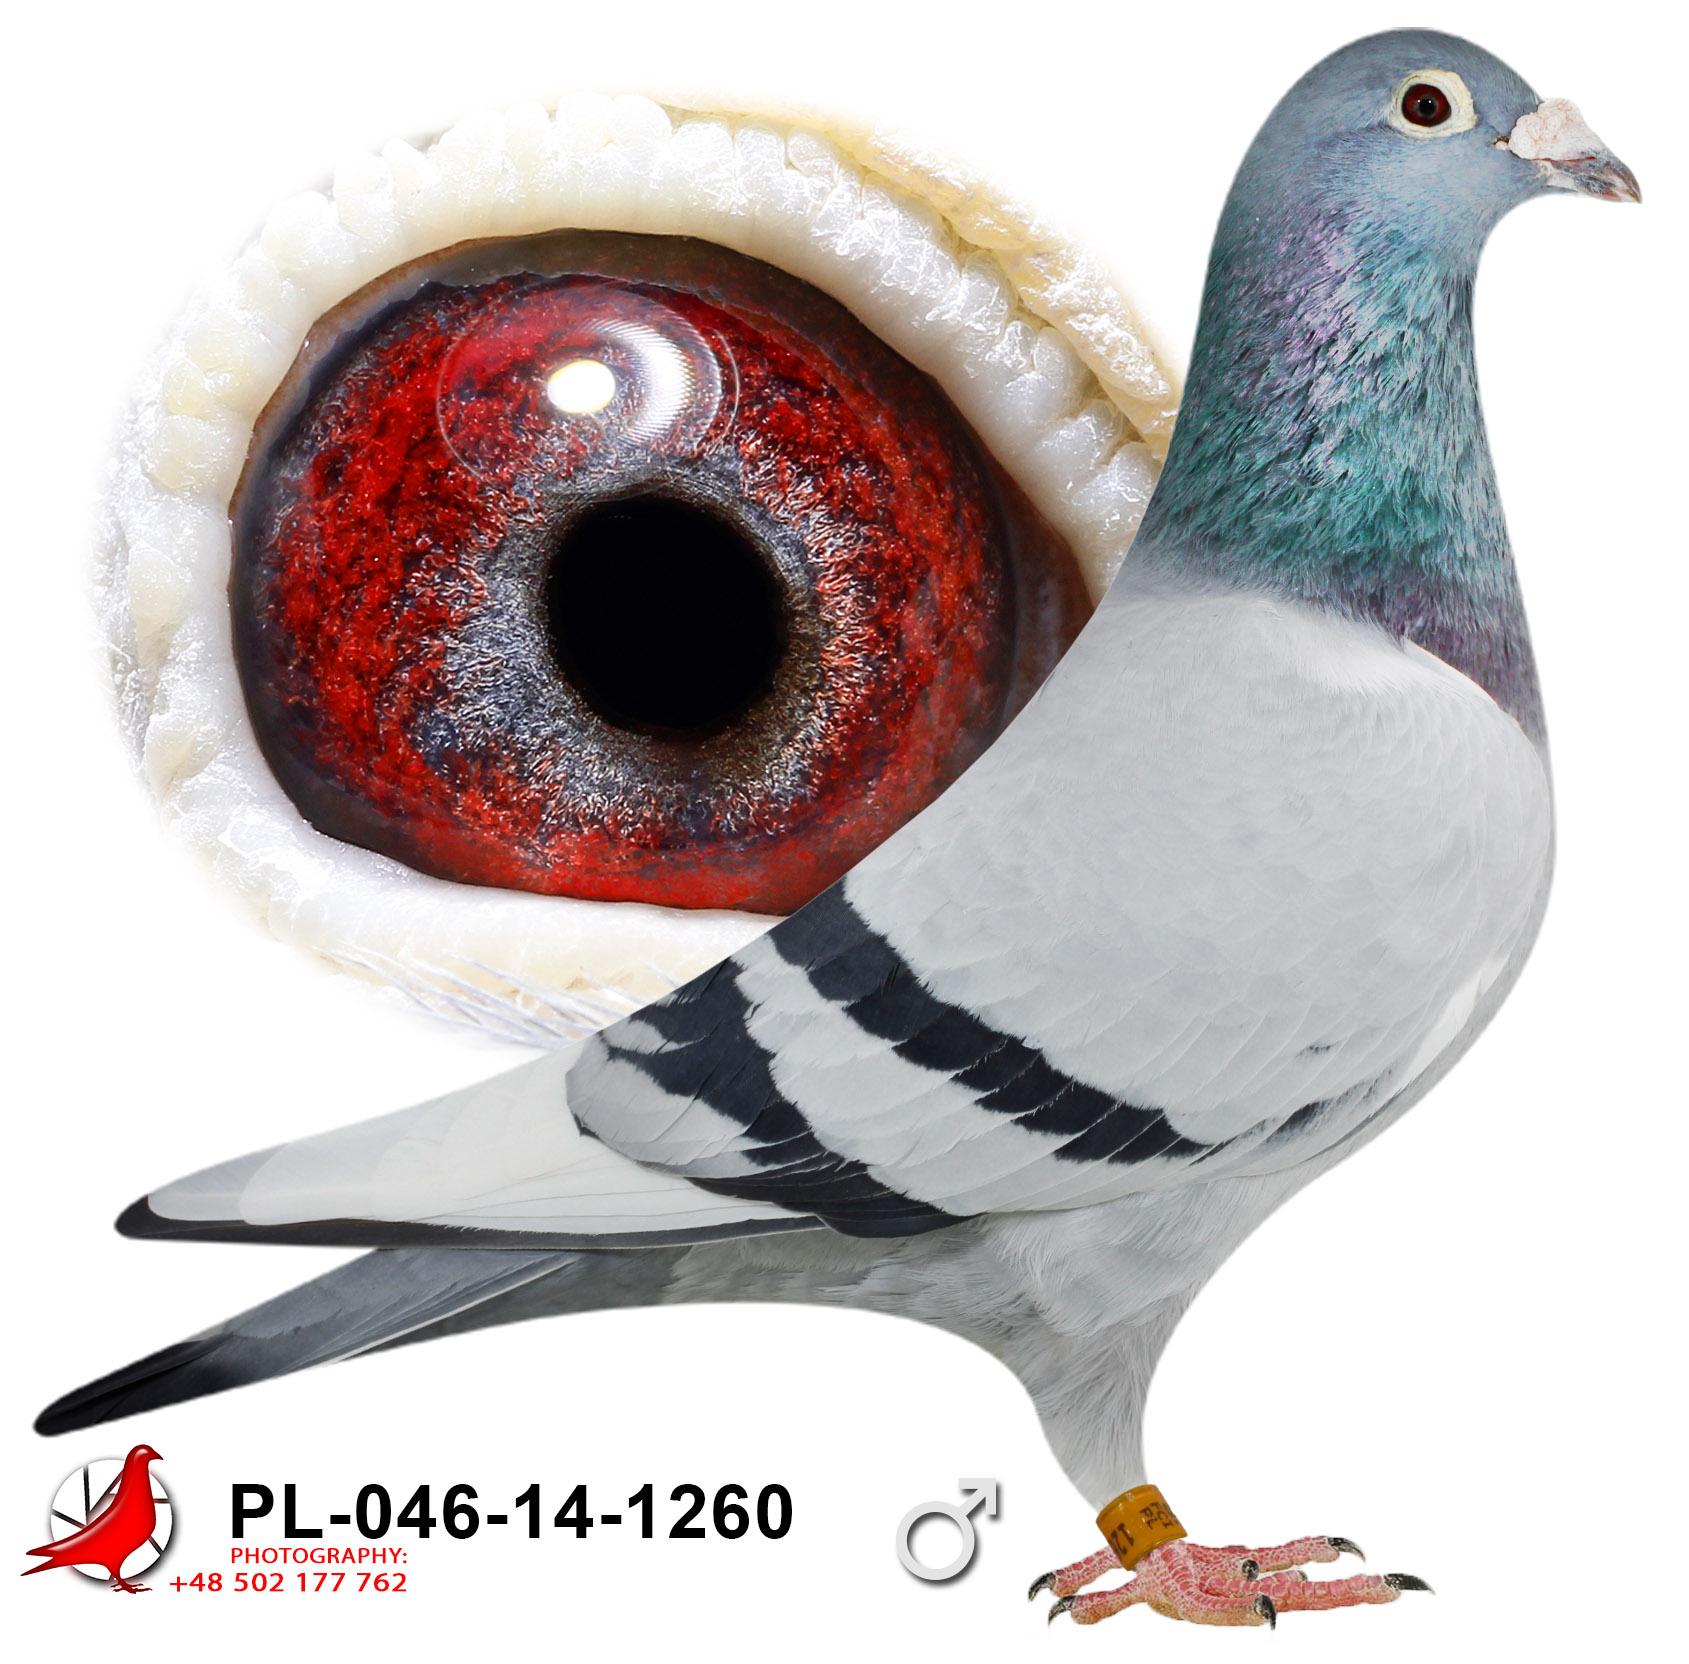 pl-046-14-1260_c